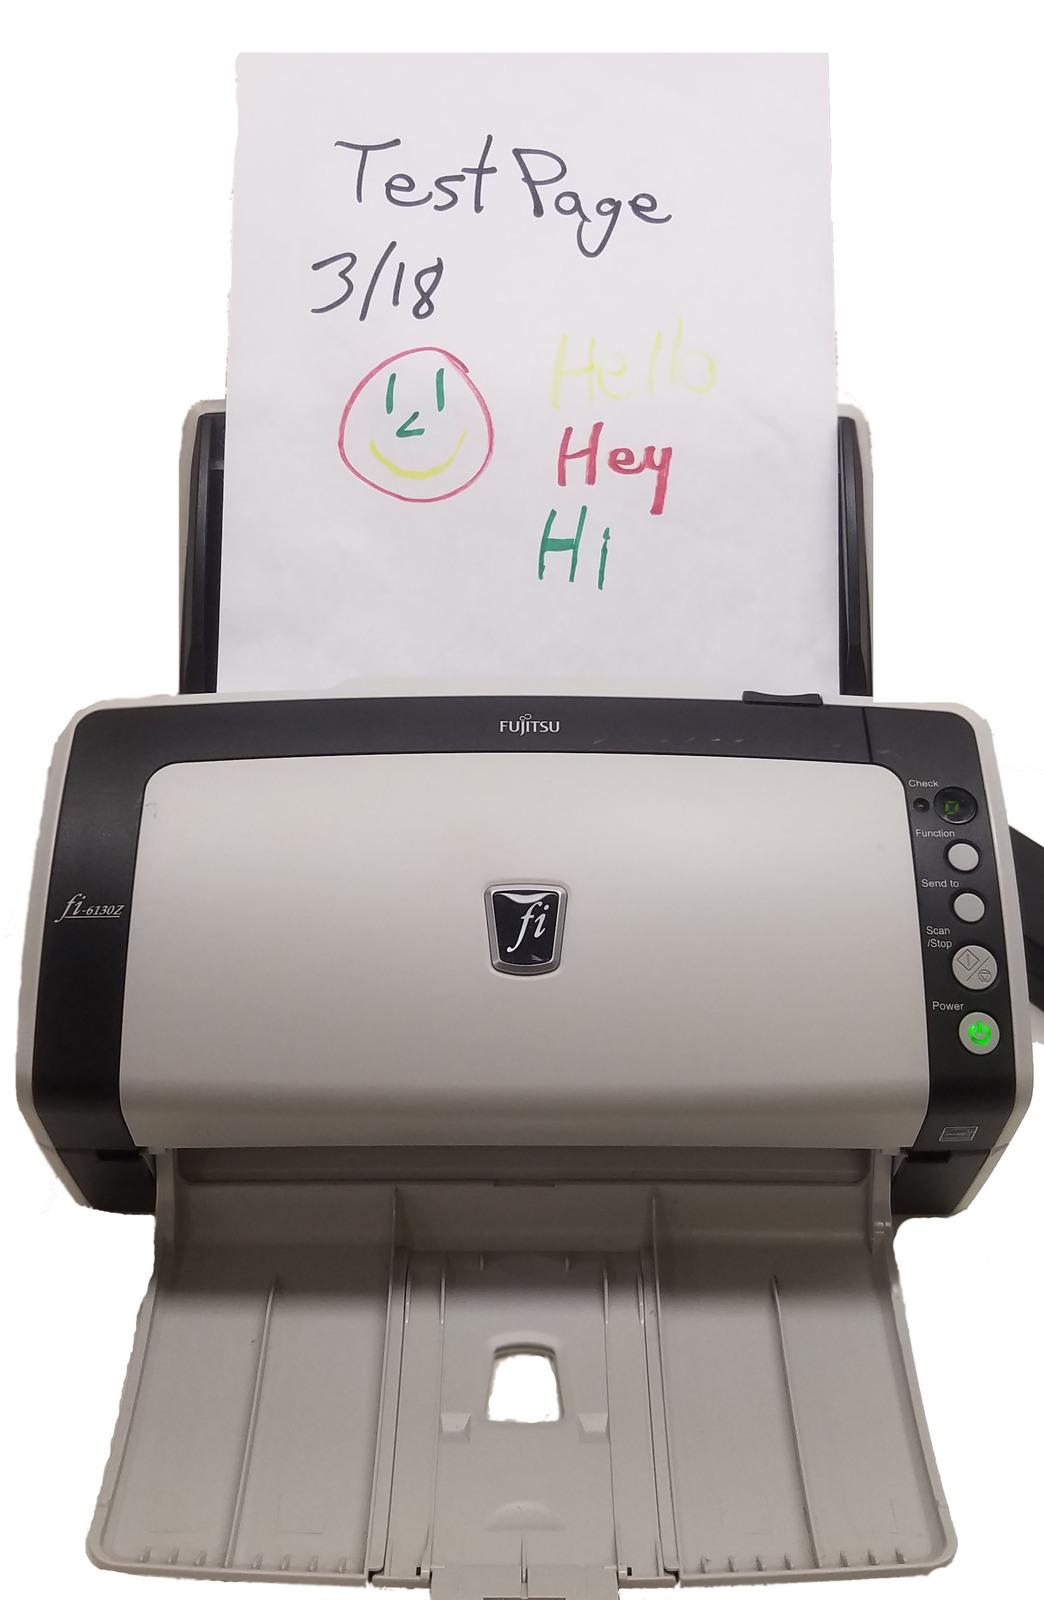 Fujitsu fi-6130Z Color Duplex Scanner With A/C Adapter Bin:1